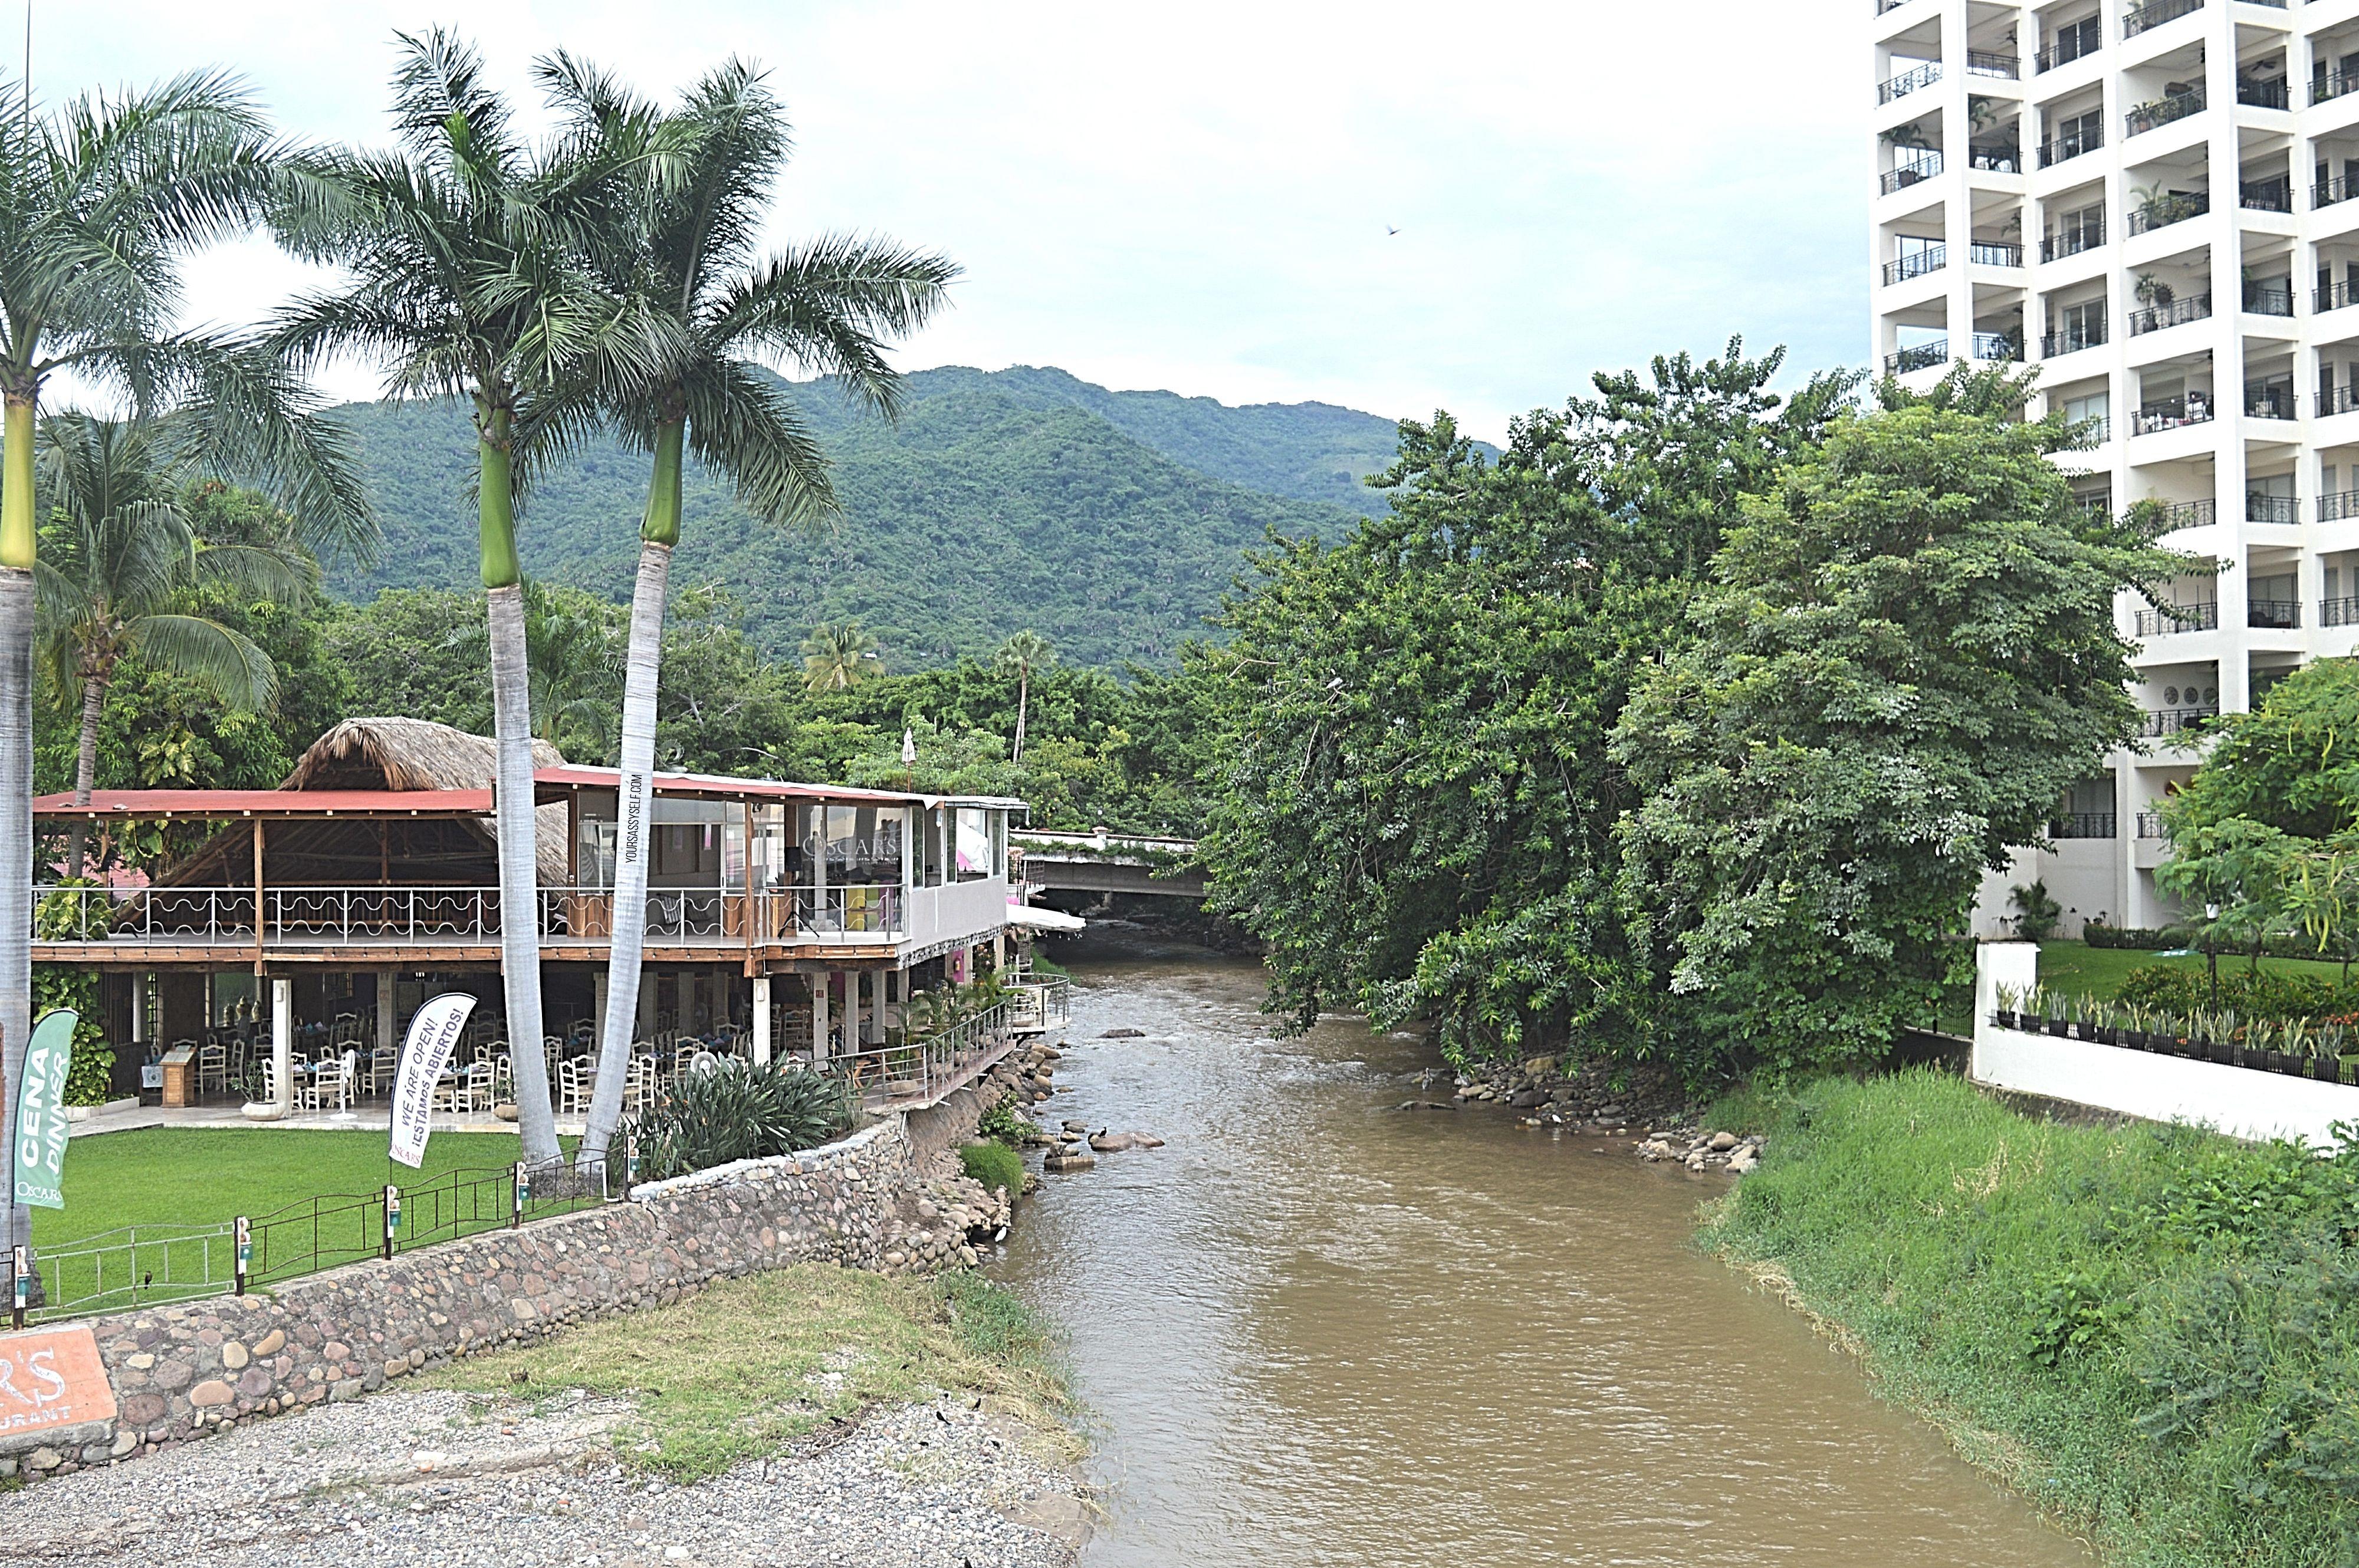 River Cuale - Puerto Vallarta - yoursassyself.com